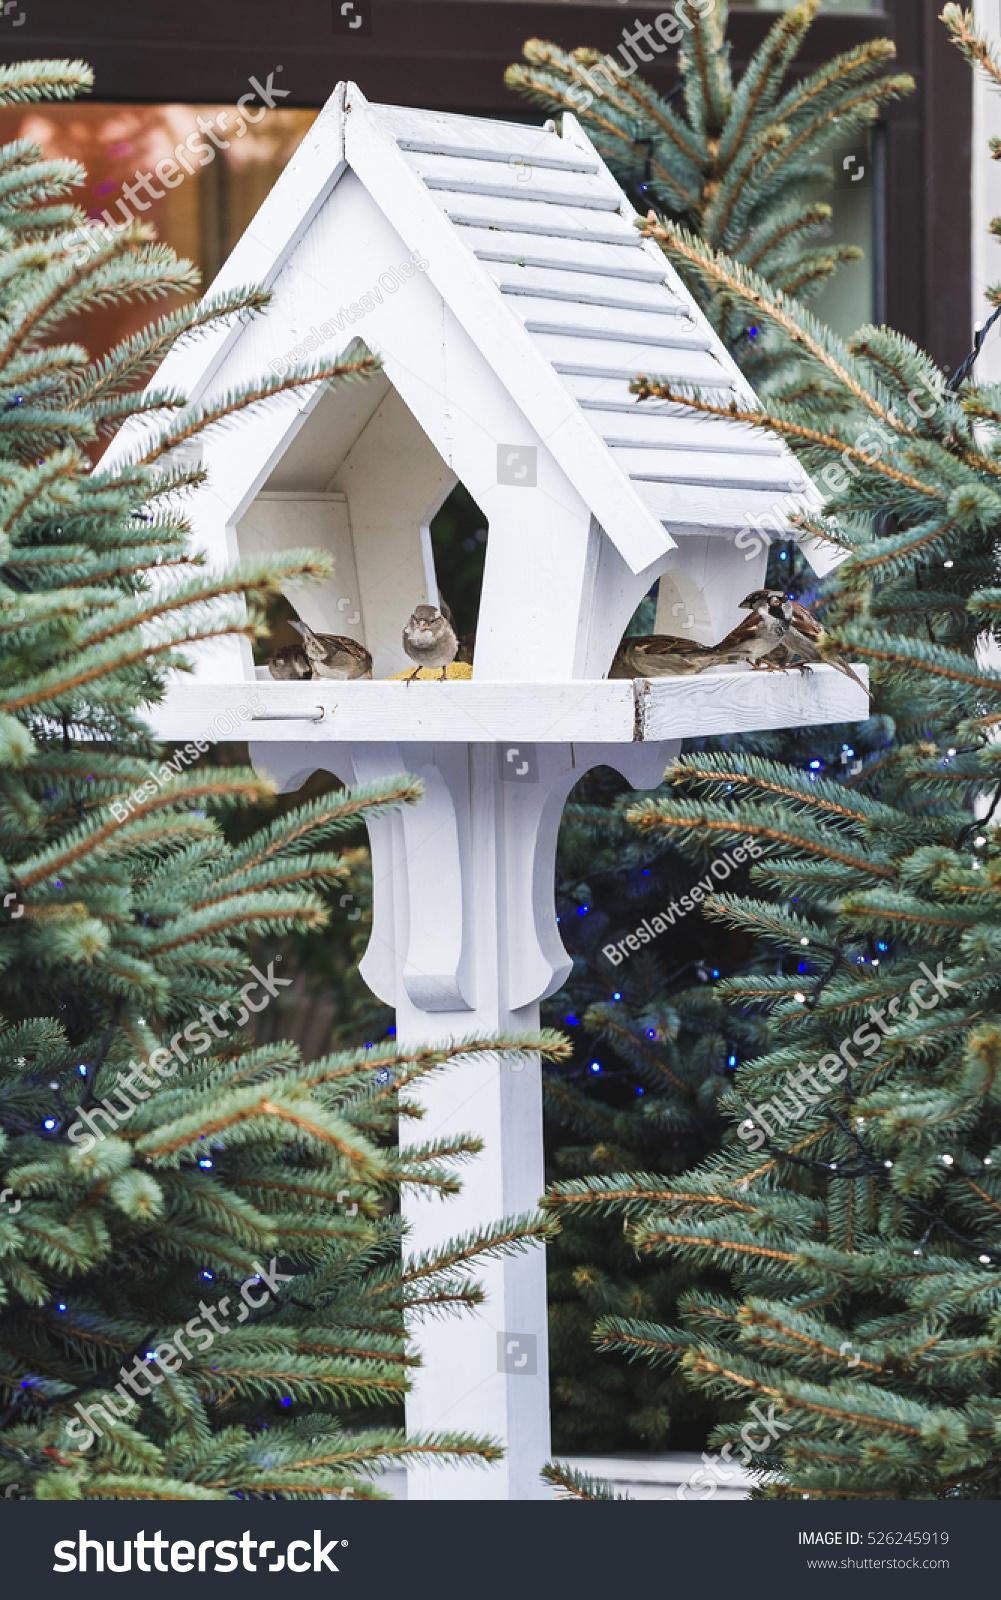 lovely outdoor bird feeders in fur trees decorations for christmas - Outdoor Christmas Tree Decorations For Birds